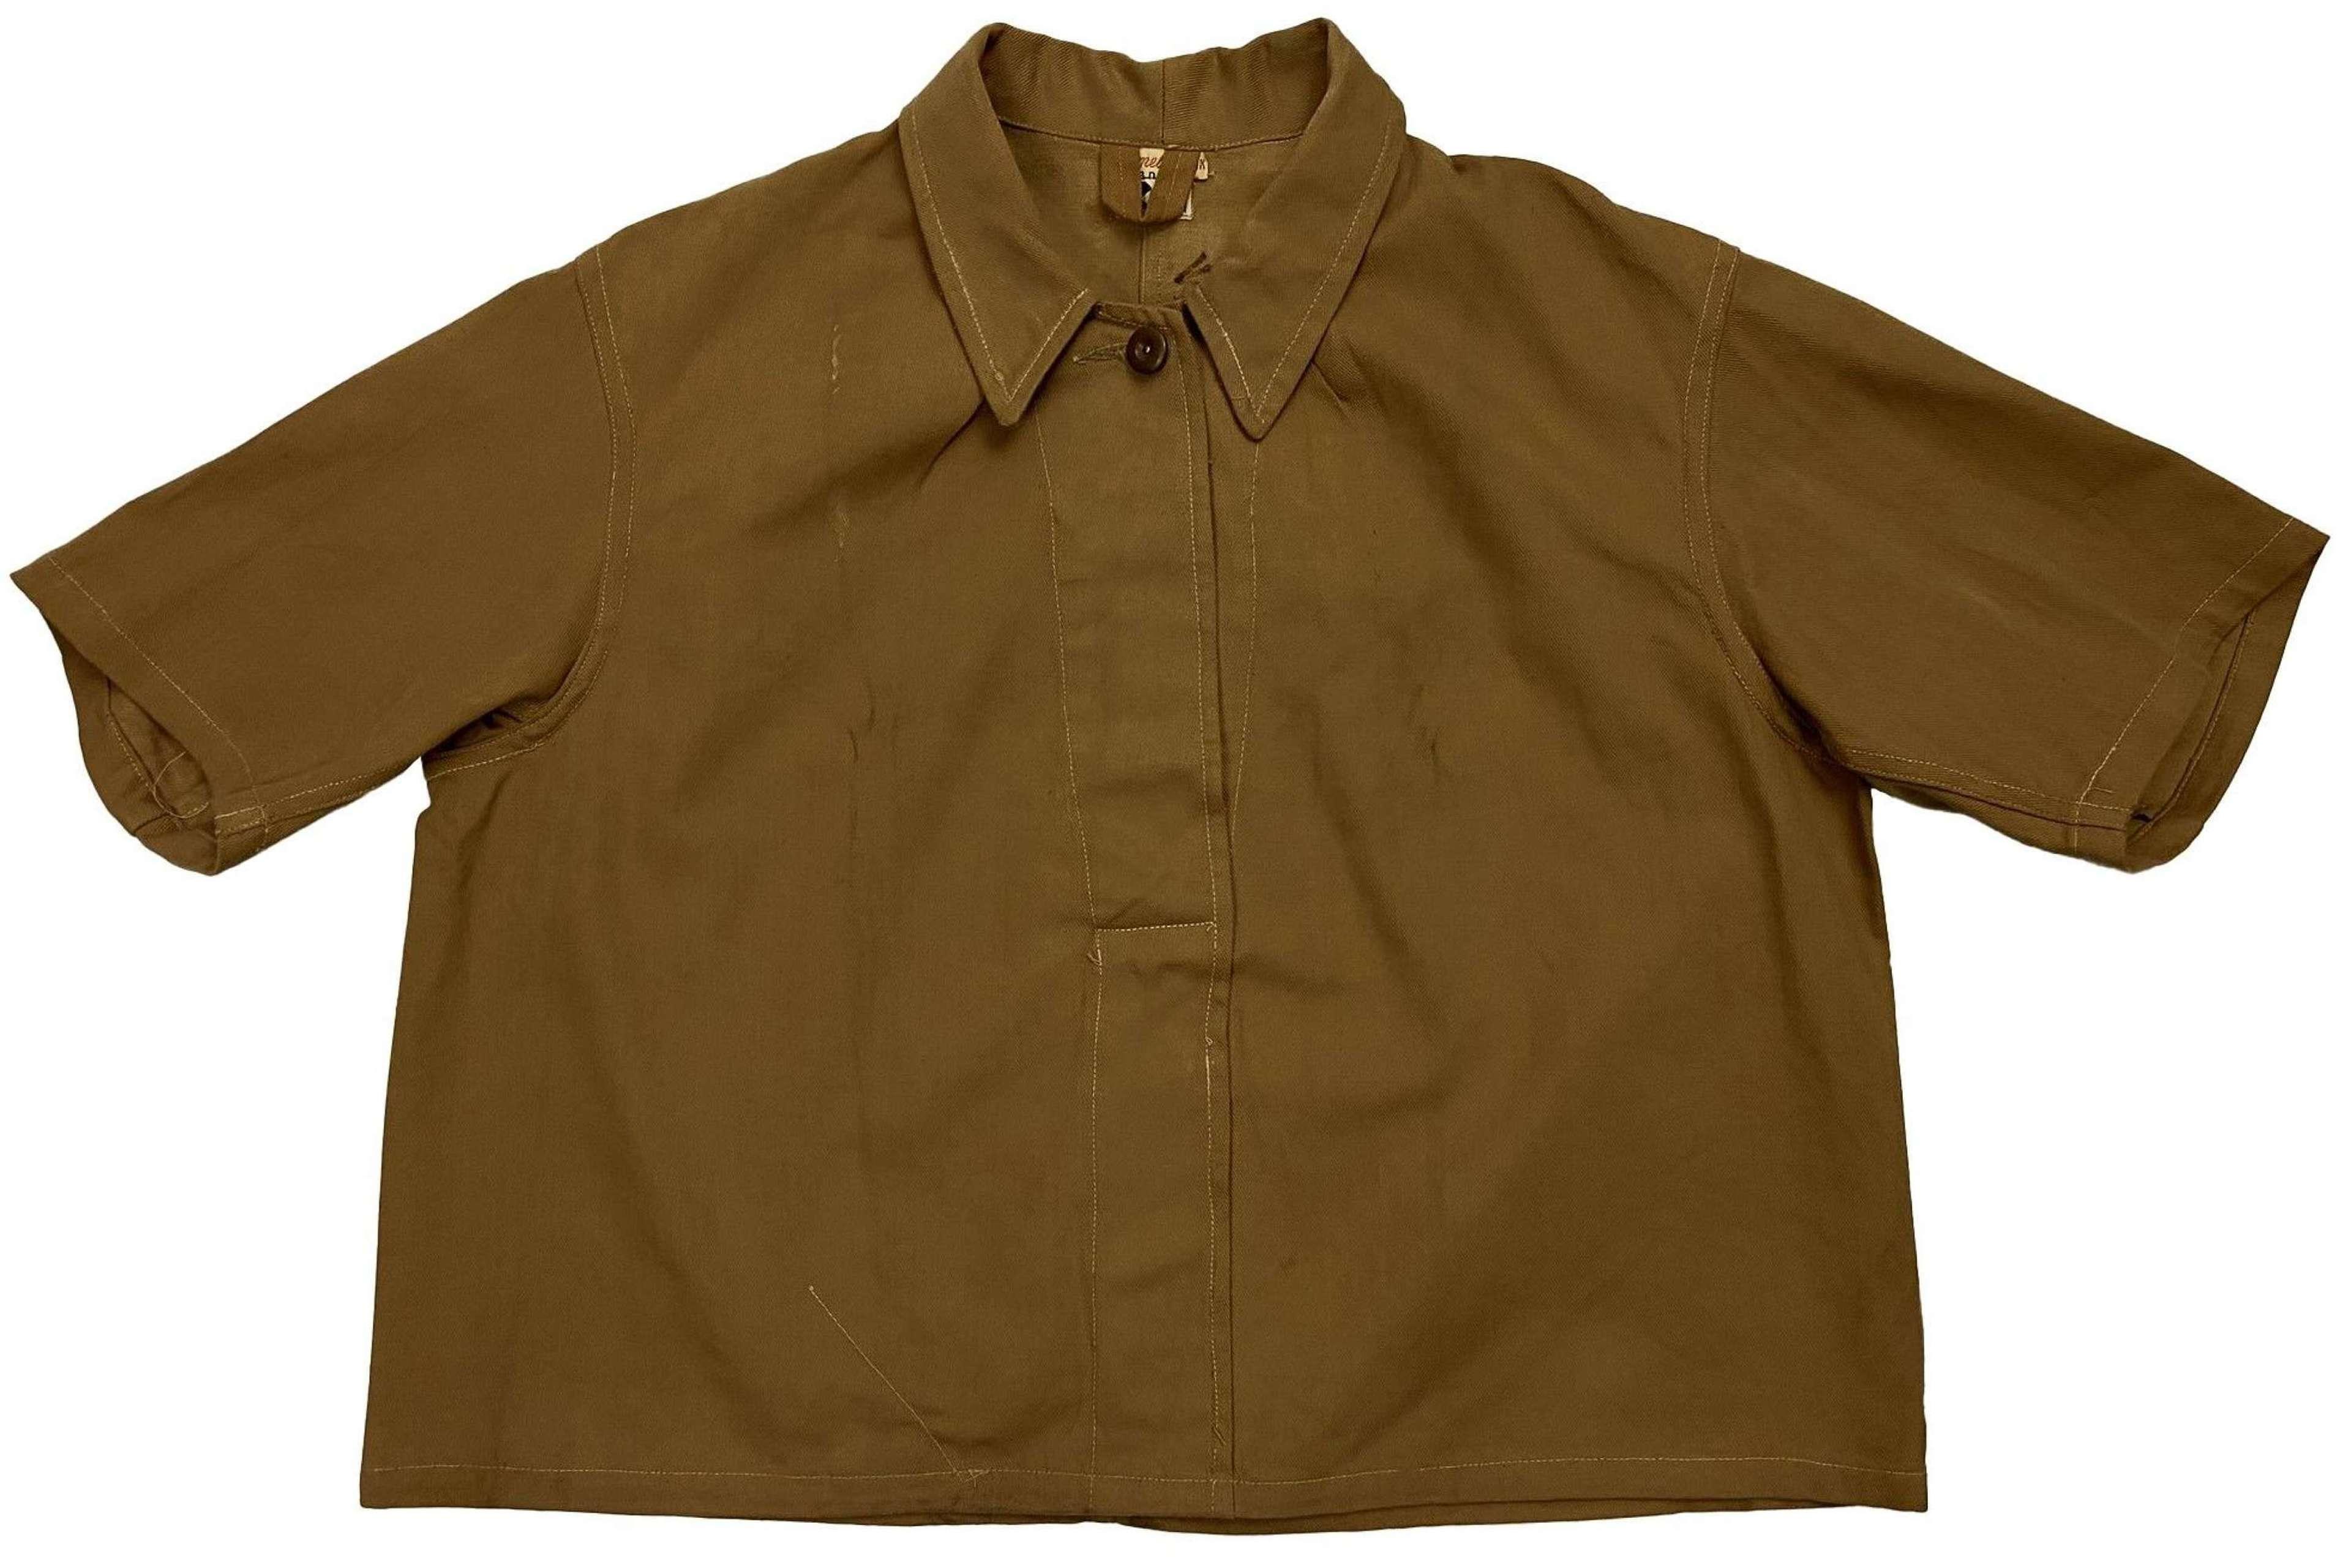 Original 1940s CC41 Factory Workers Workwear Bolero Top by 'Leader'